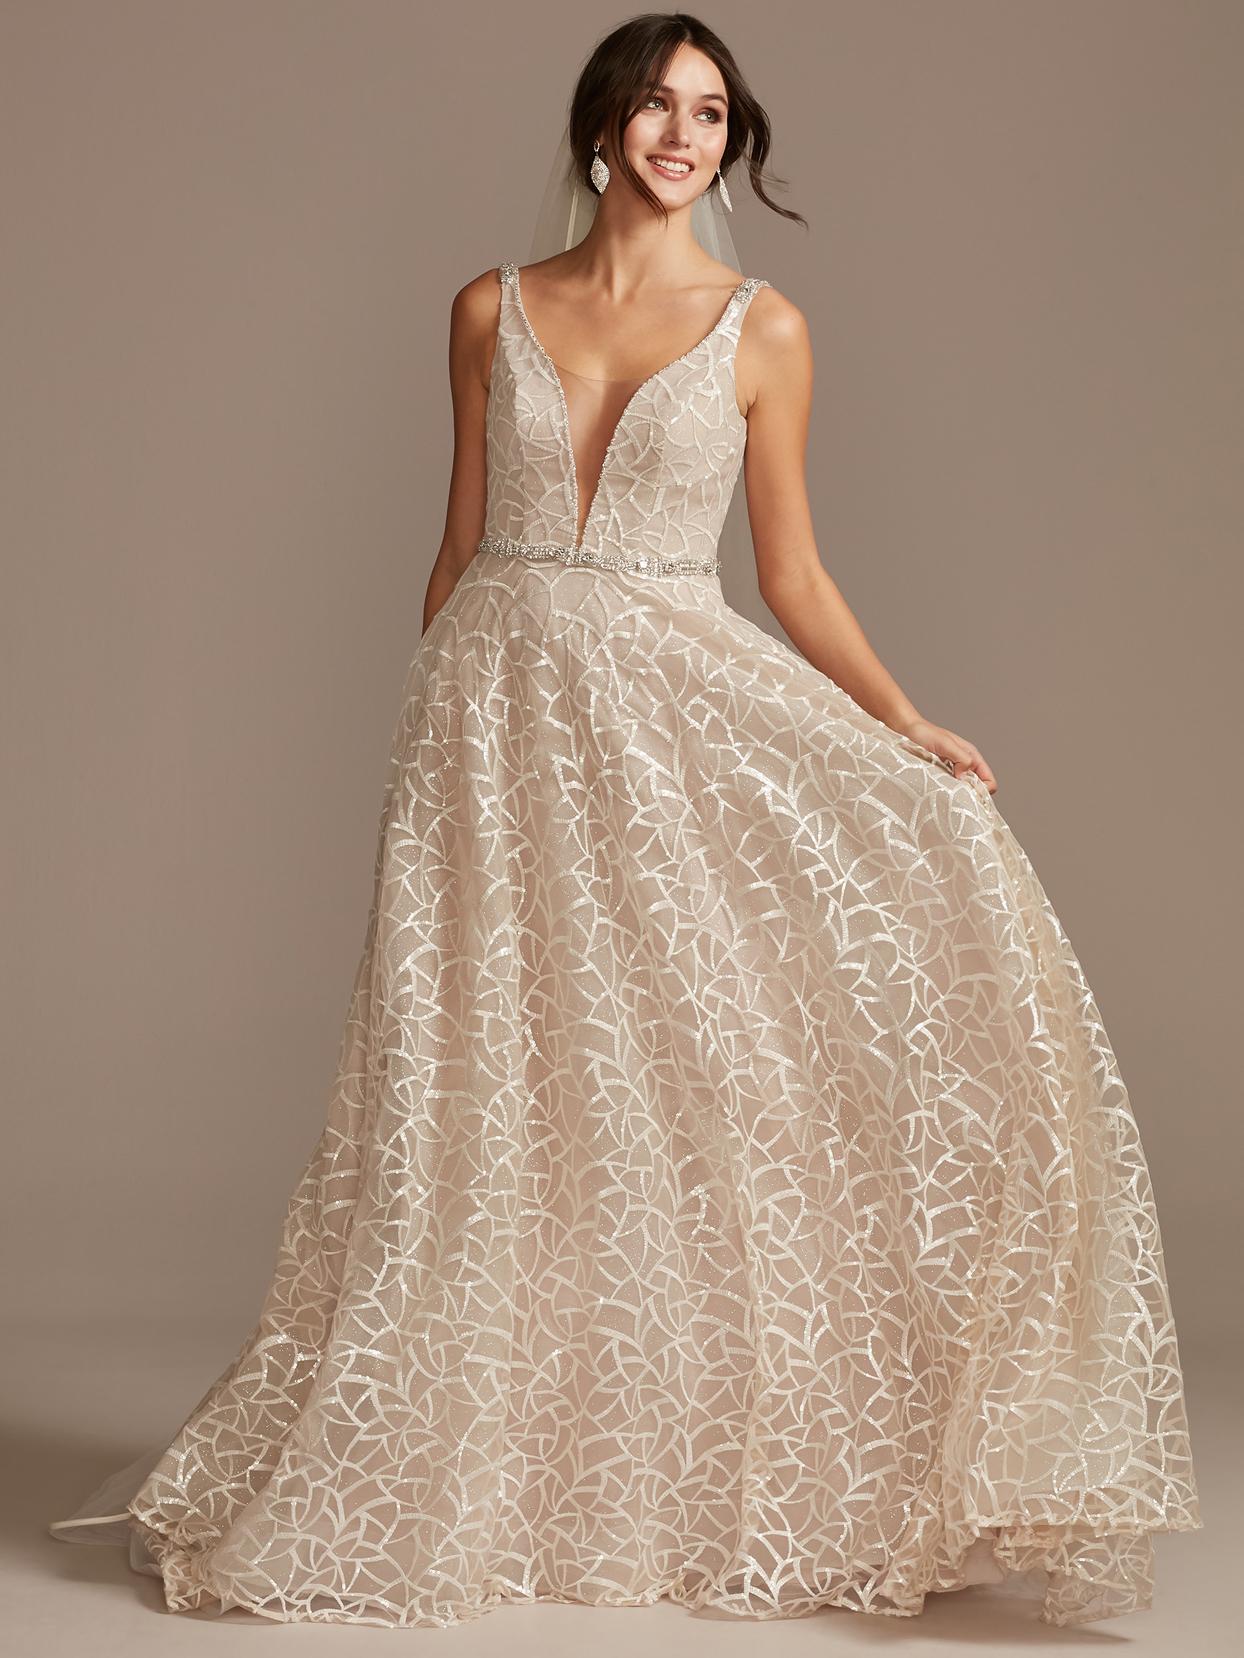 davids bridal plunging v-neck beaded waist wedding dress spring 2021